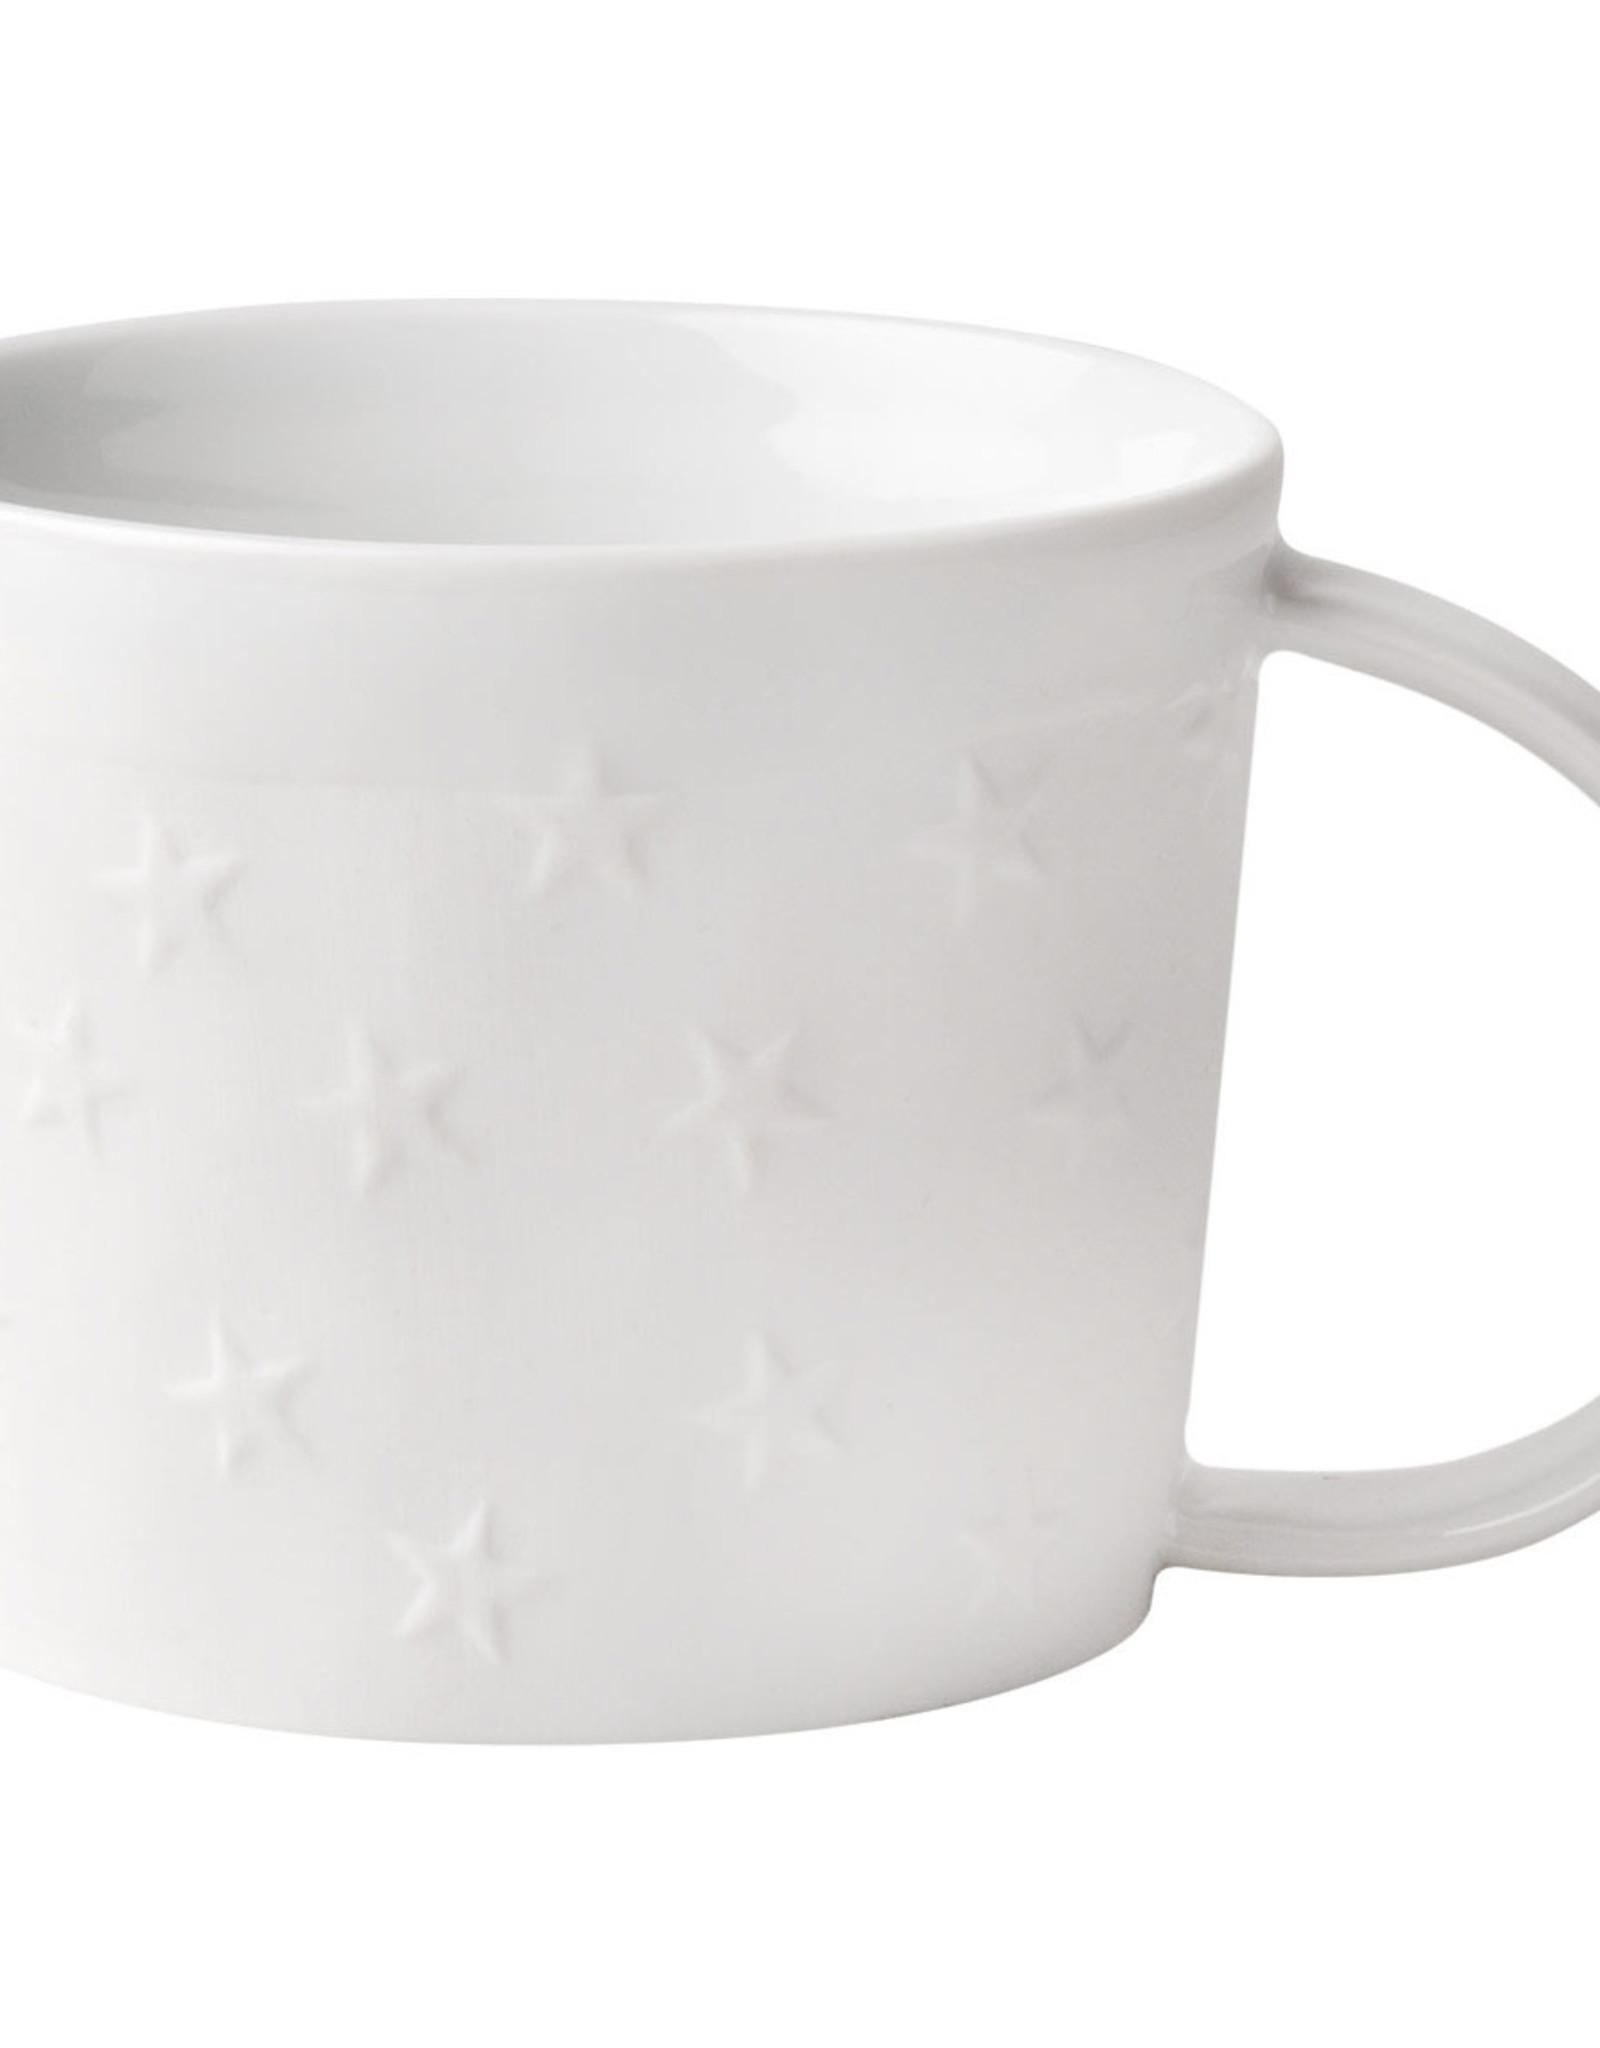 Rader Tasse étoiles